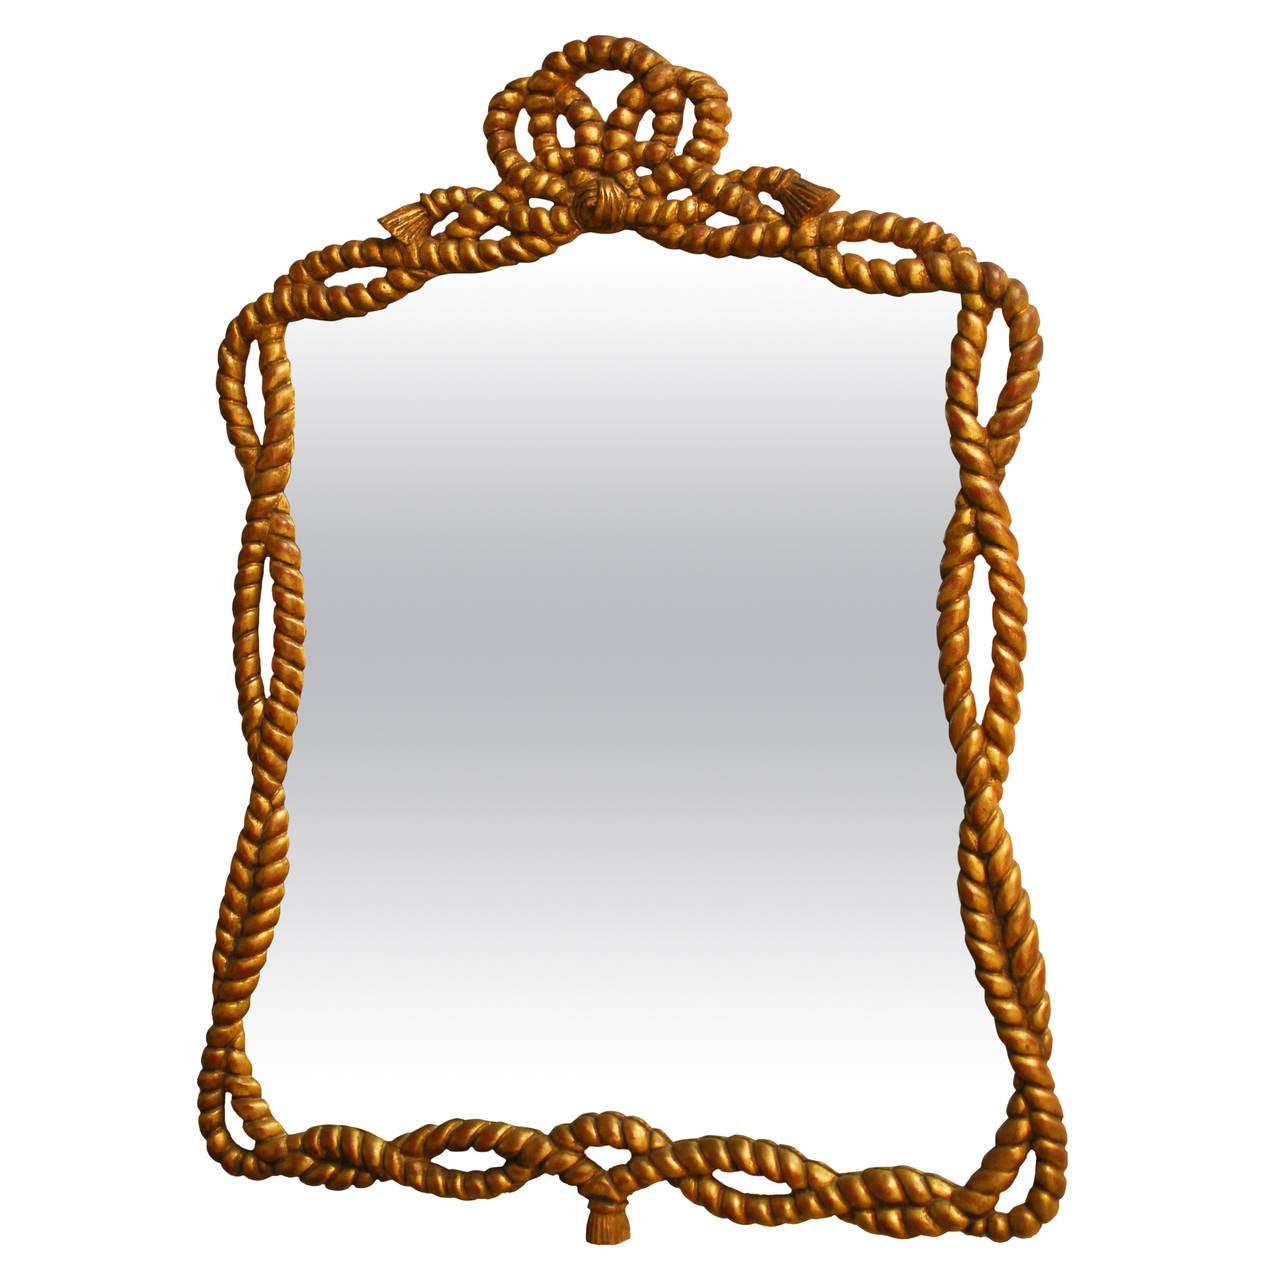 Napoleon III Carved Giltwood Rope Twist Mirror 1